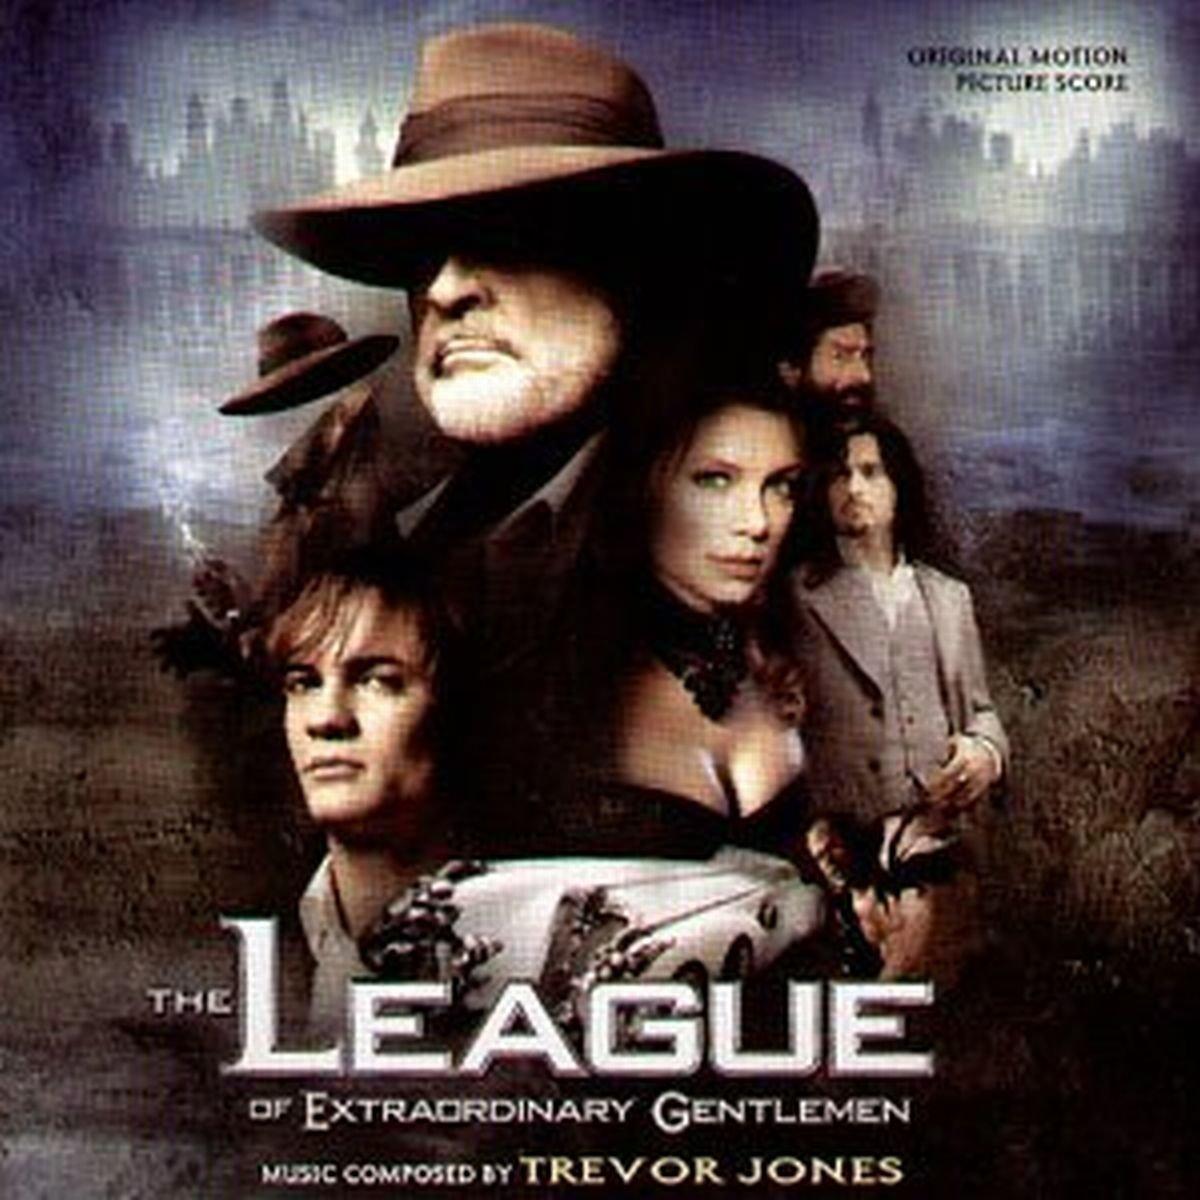 bande originale soundtrack ost score ligue league gentlemen extraordinaire Extraordinary disney fox